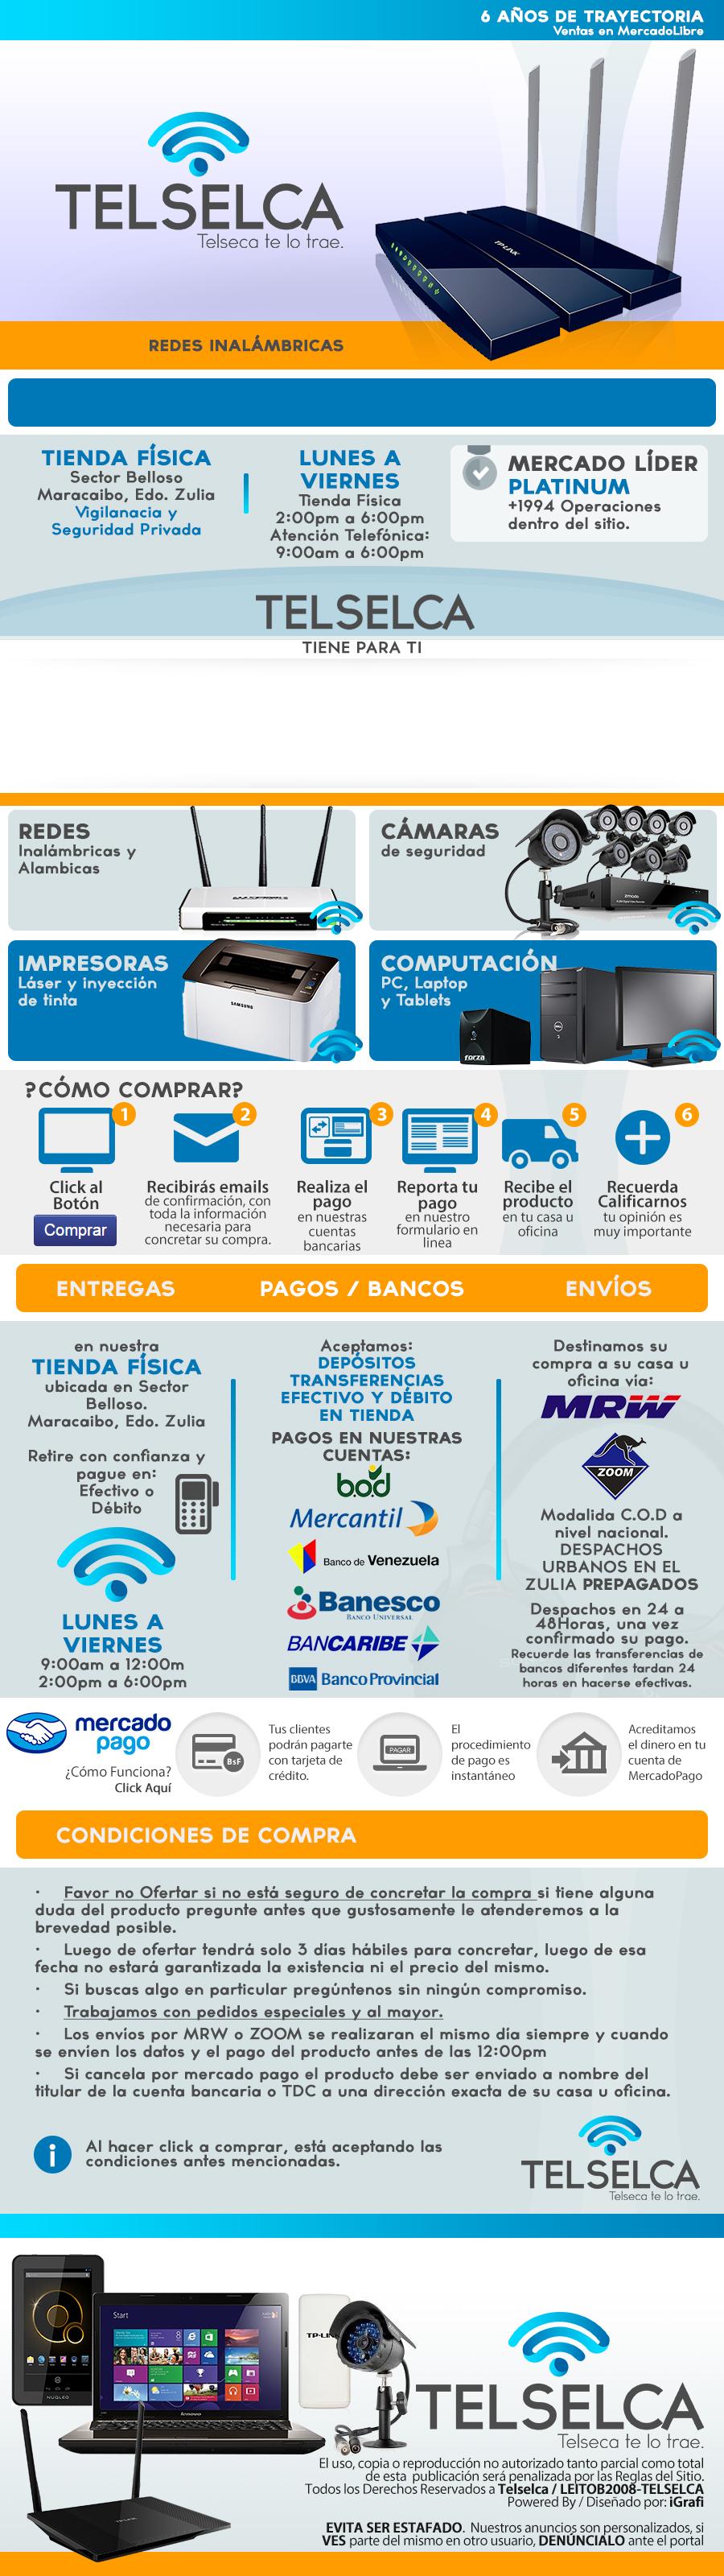 Cliente Telselca. Venta de productos de computación, accesorios ...